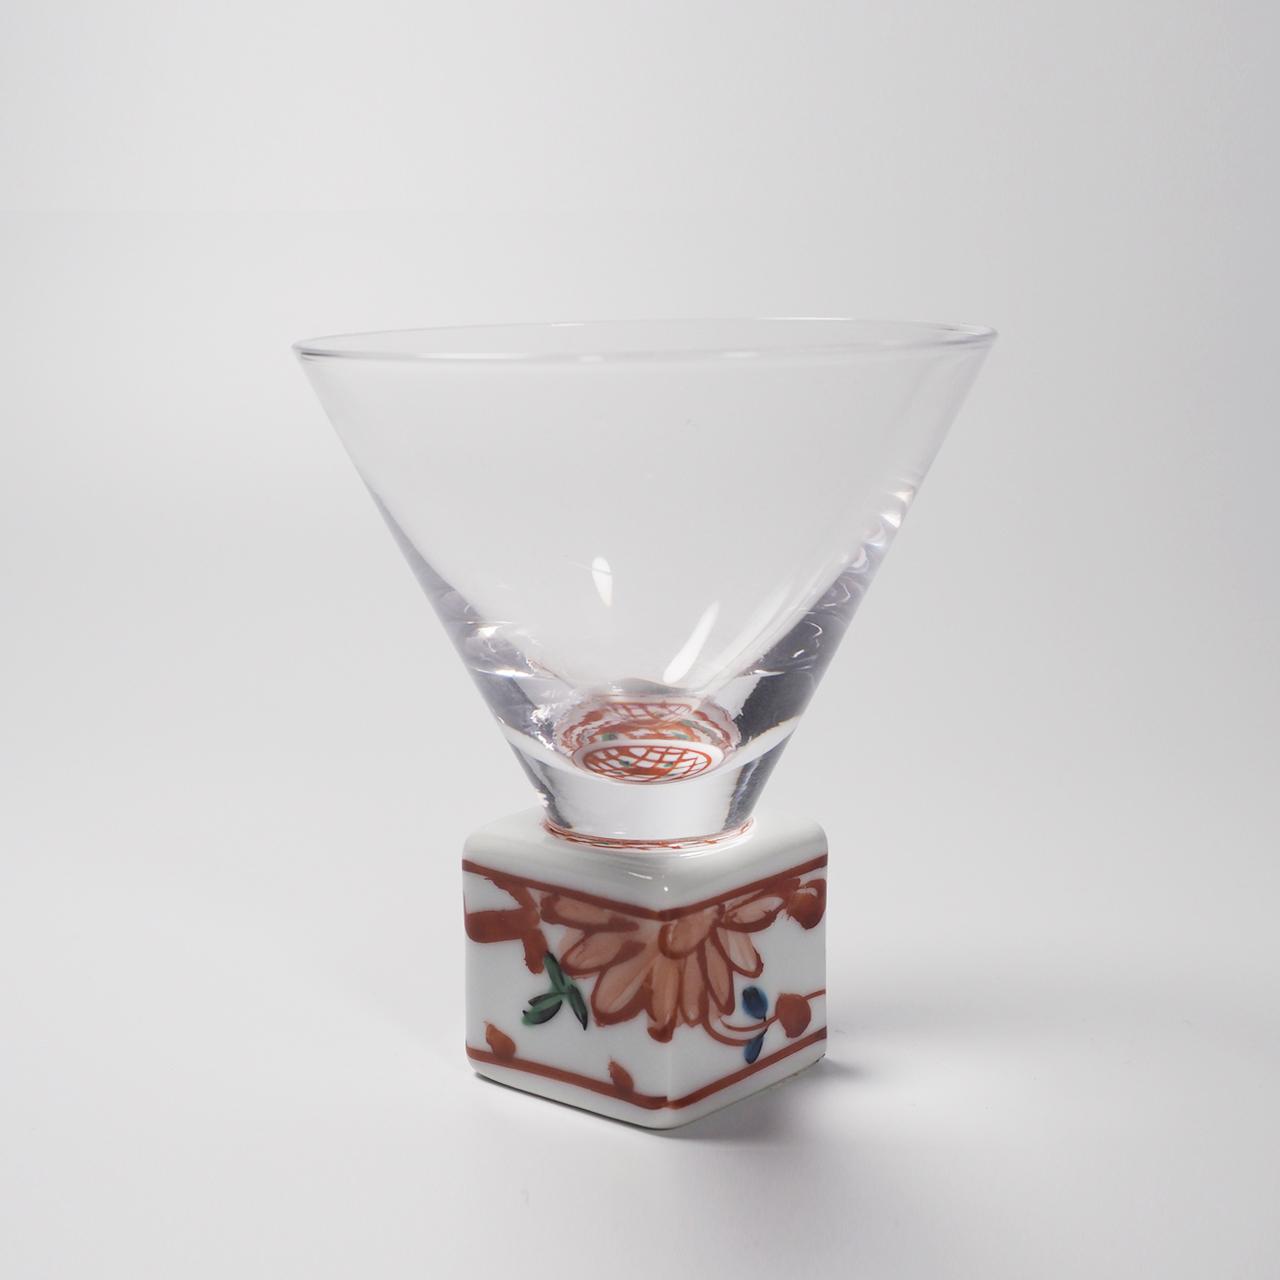 酒グラス(正角) 赤絵錦剣先万歴 20-003-A